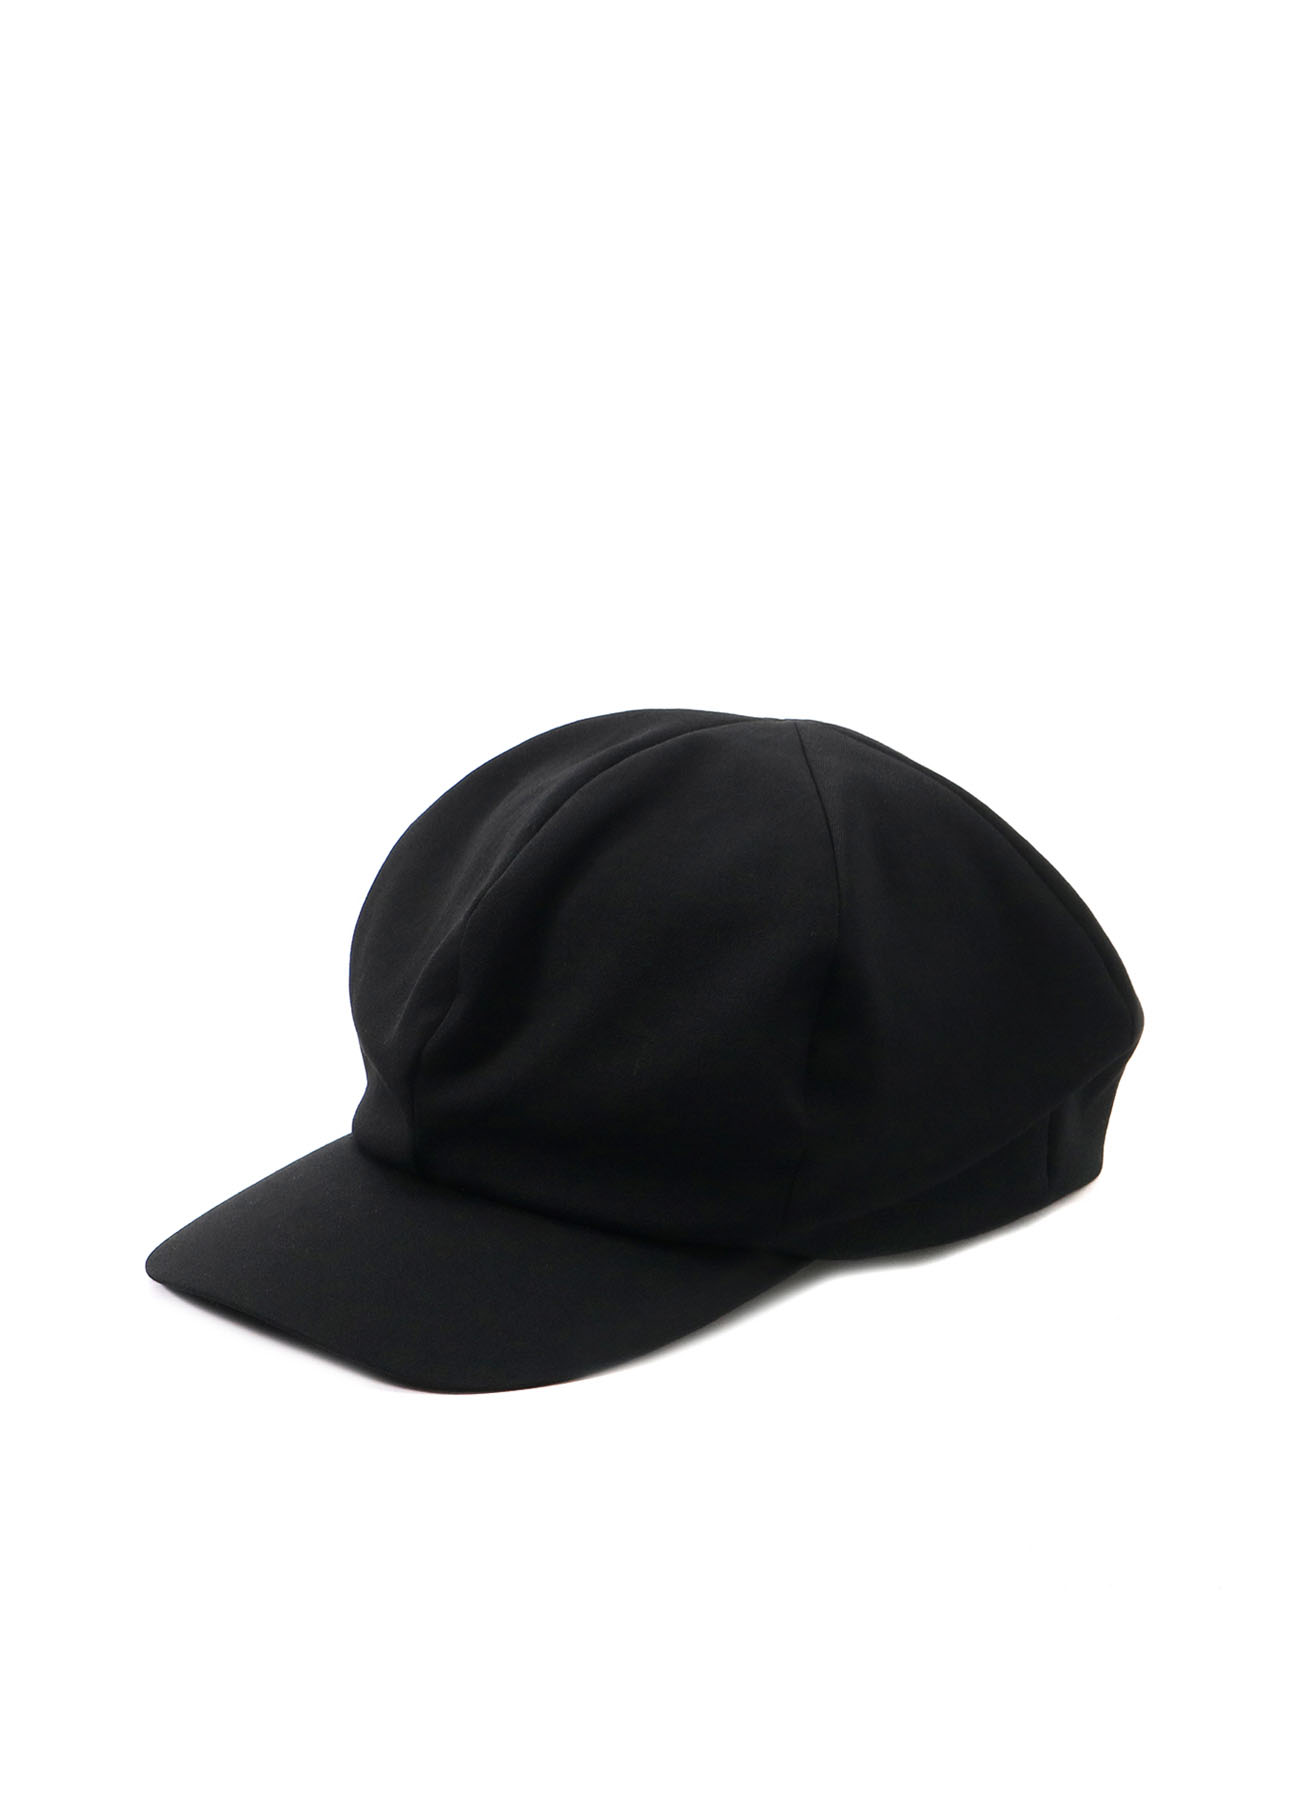 W/GABARDINE LAYERED NEWSBOY CAP